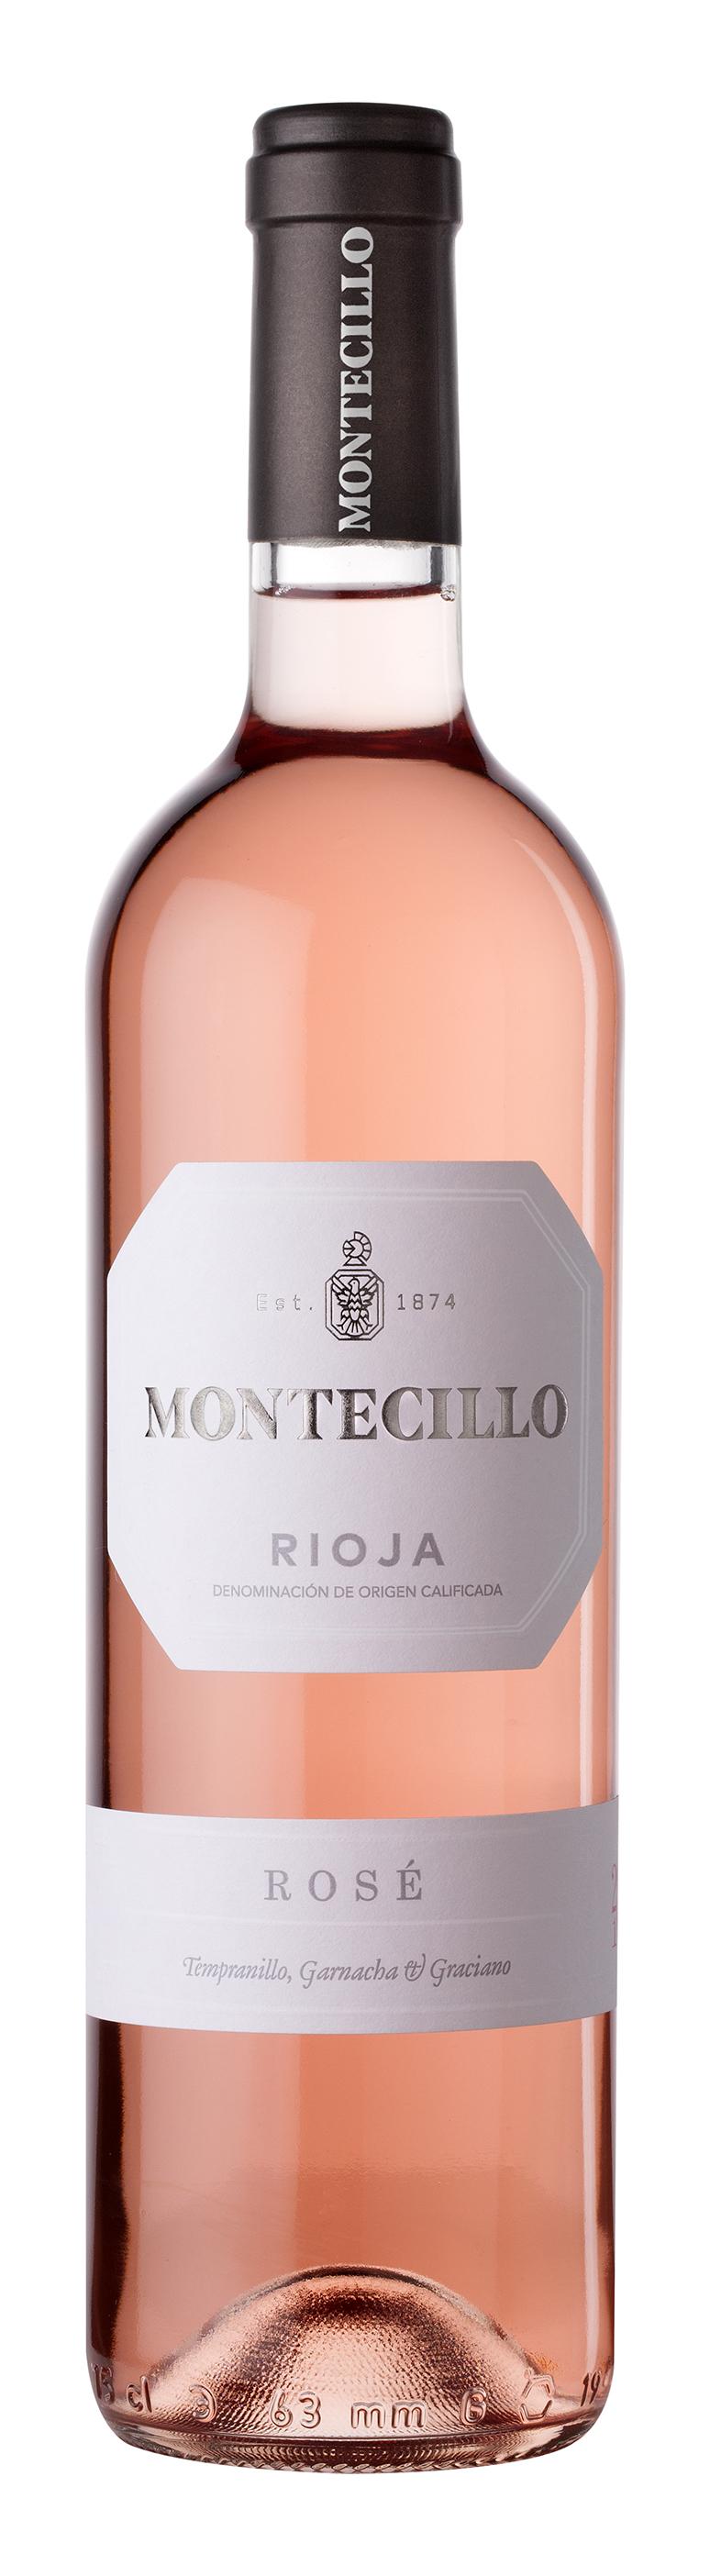 Montecillo Rioja Rosado